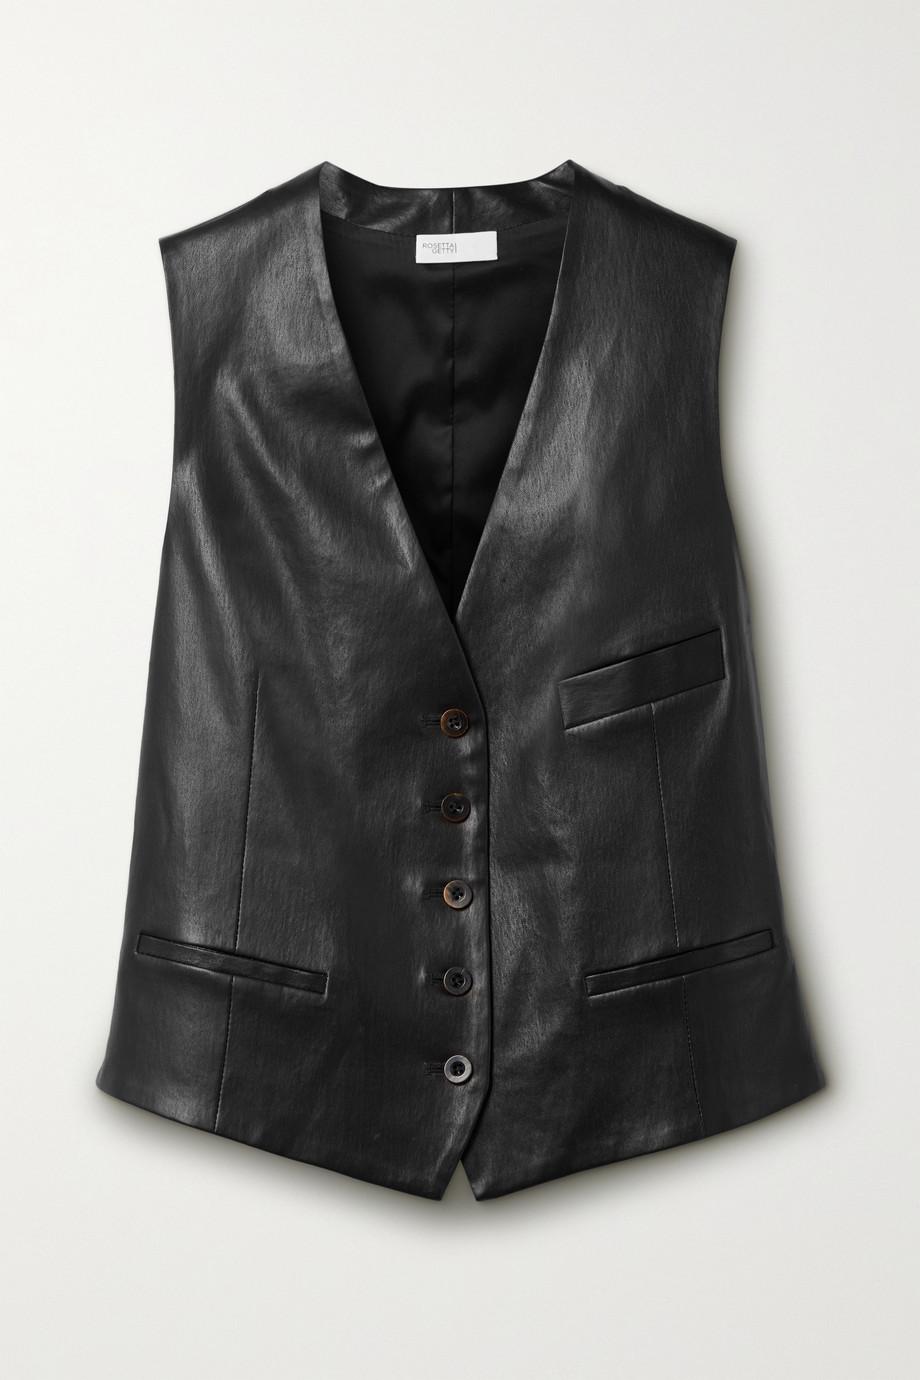 Rosetta Getty Leather vest